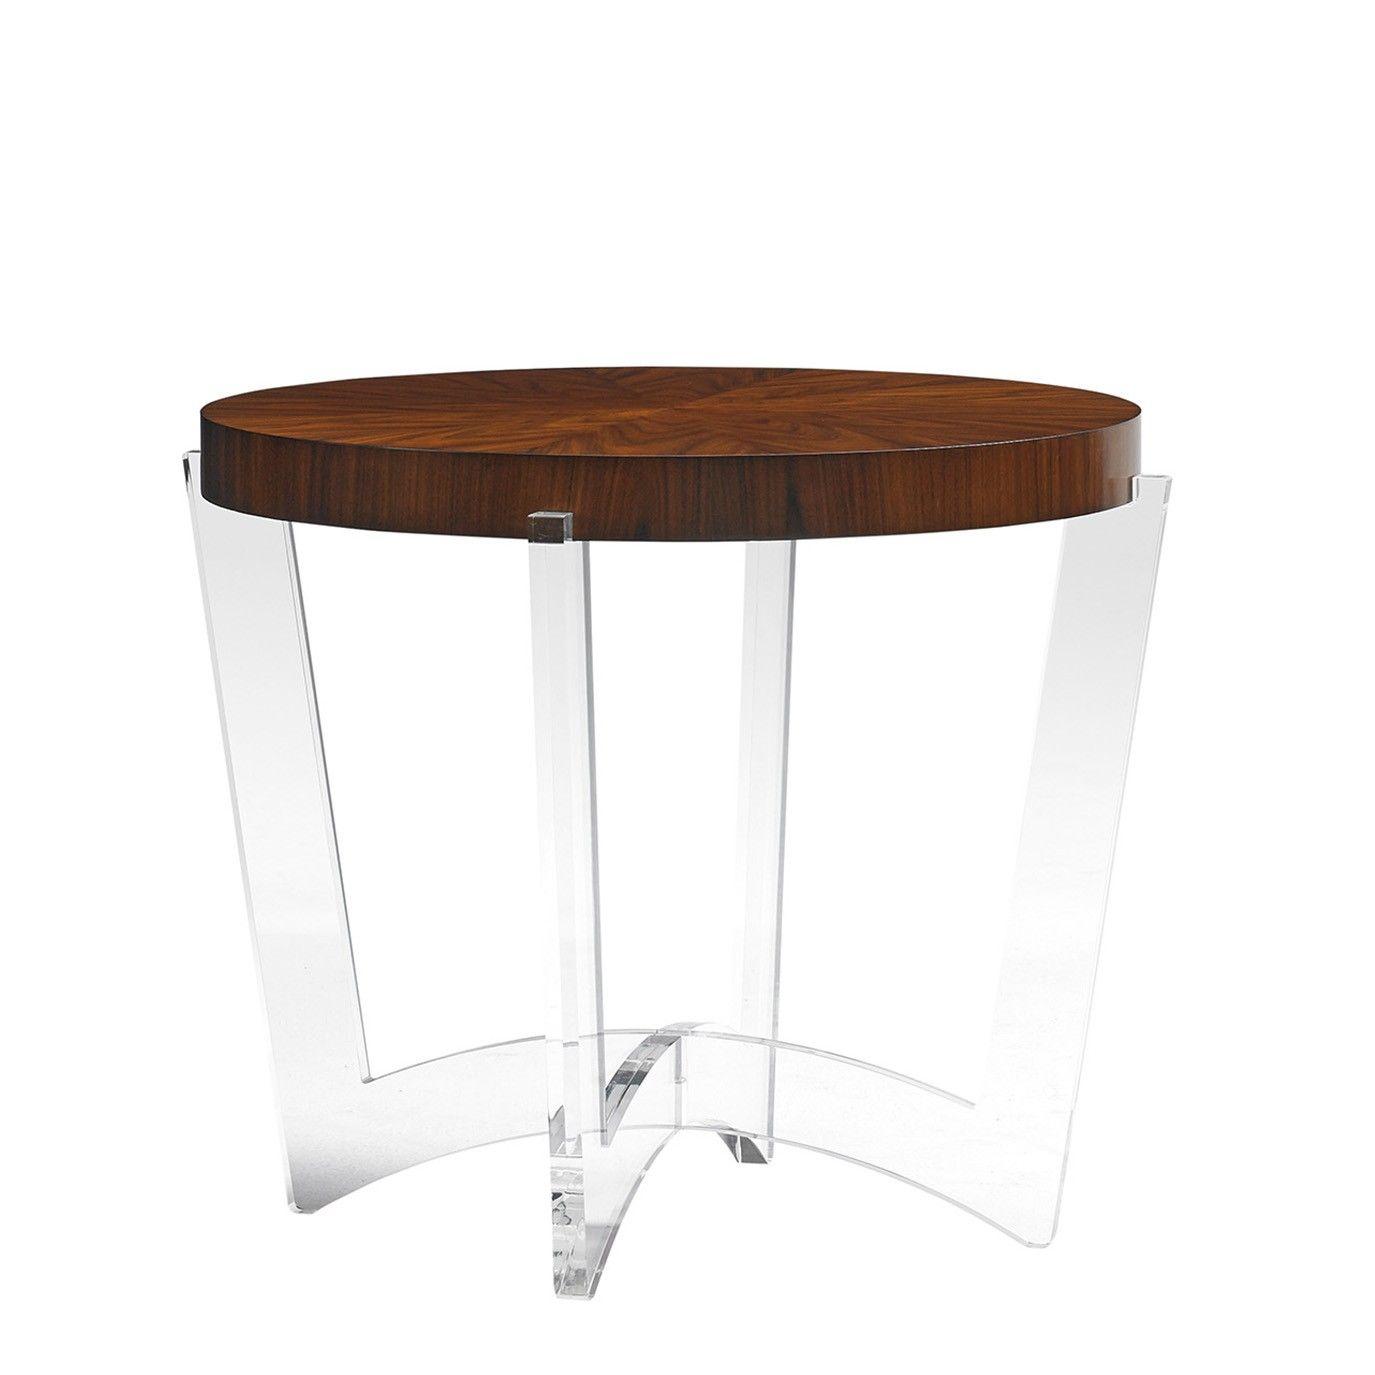 Hudson End Table Sku Lx T5 01 0723 950c Lexington Free Shipping End Tables Table Side Table